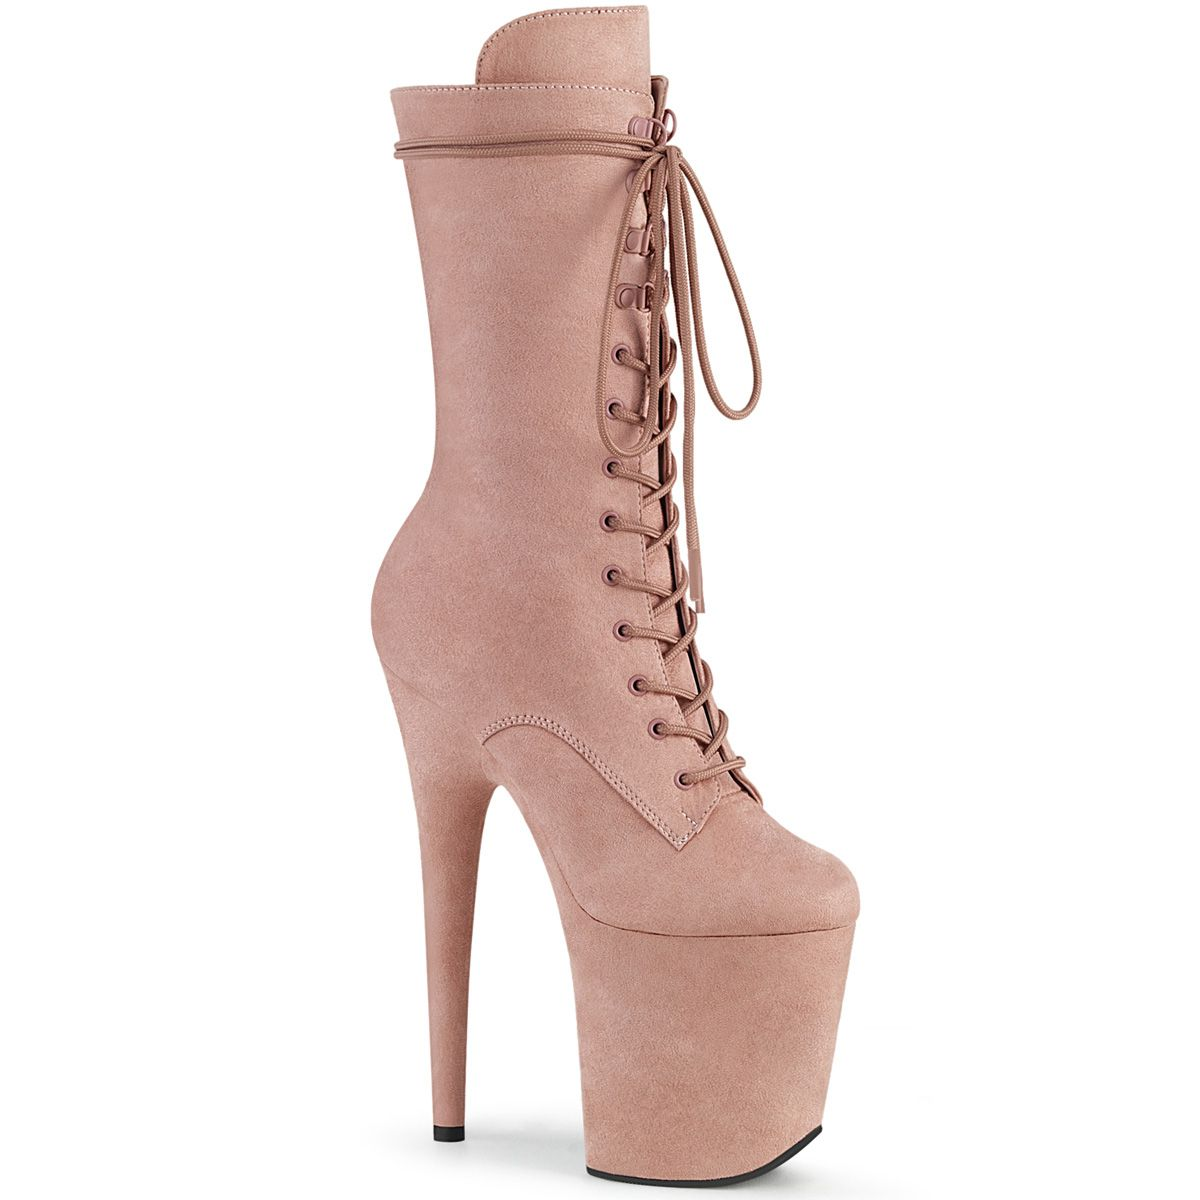 Bota Flamingo 1050 FS Veludo Ankle Boot EXT - Pleaser (encomenda)